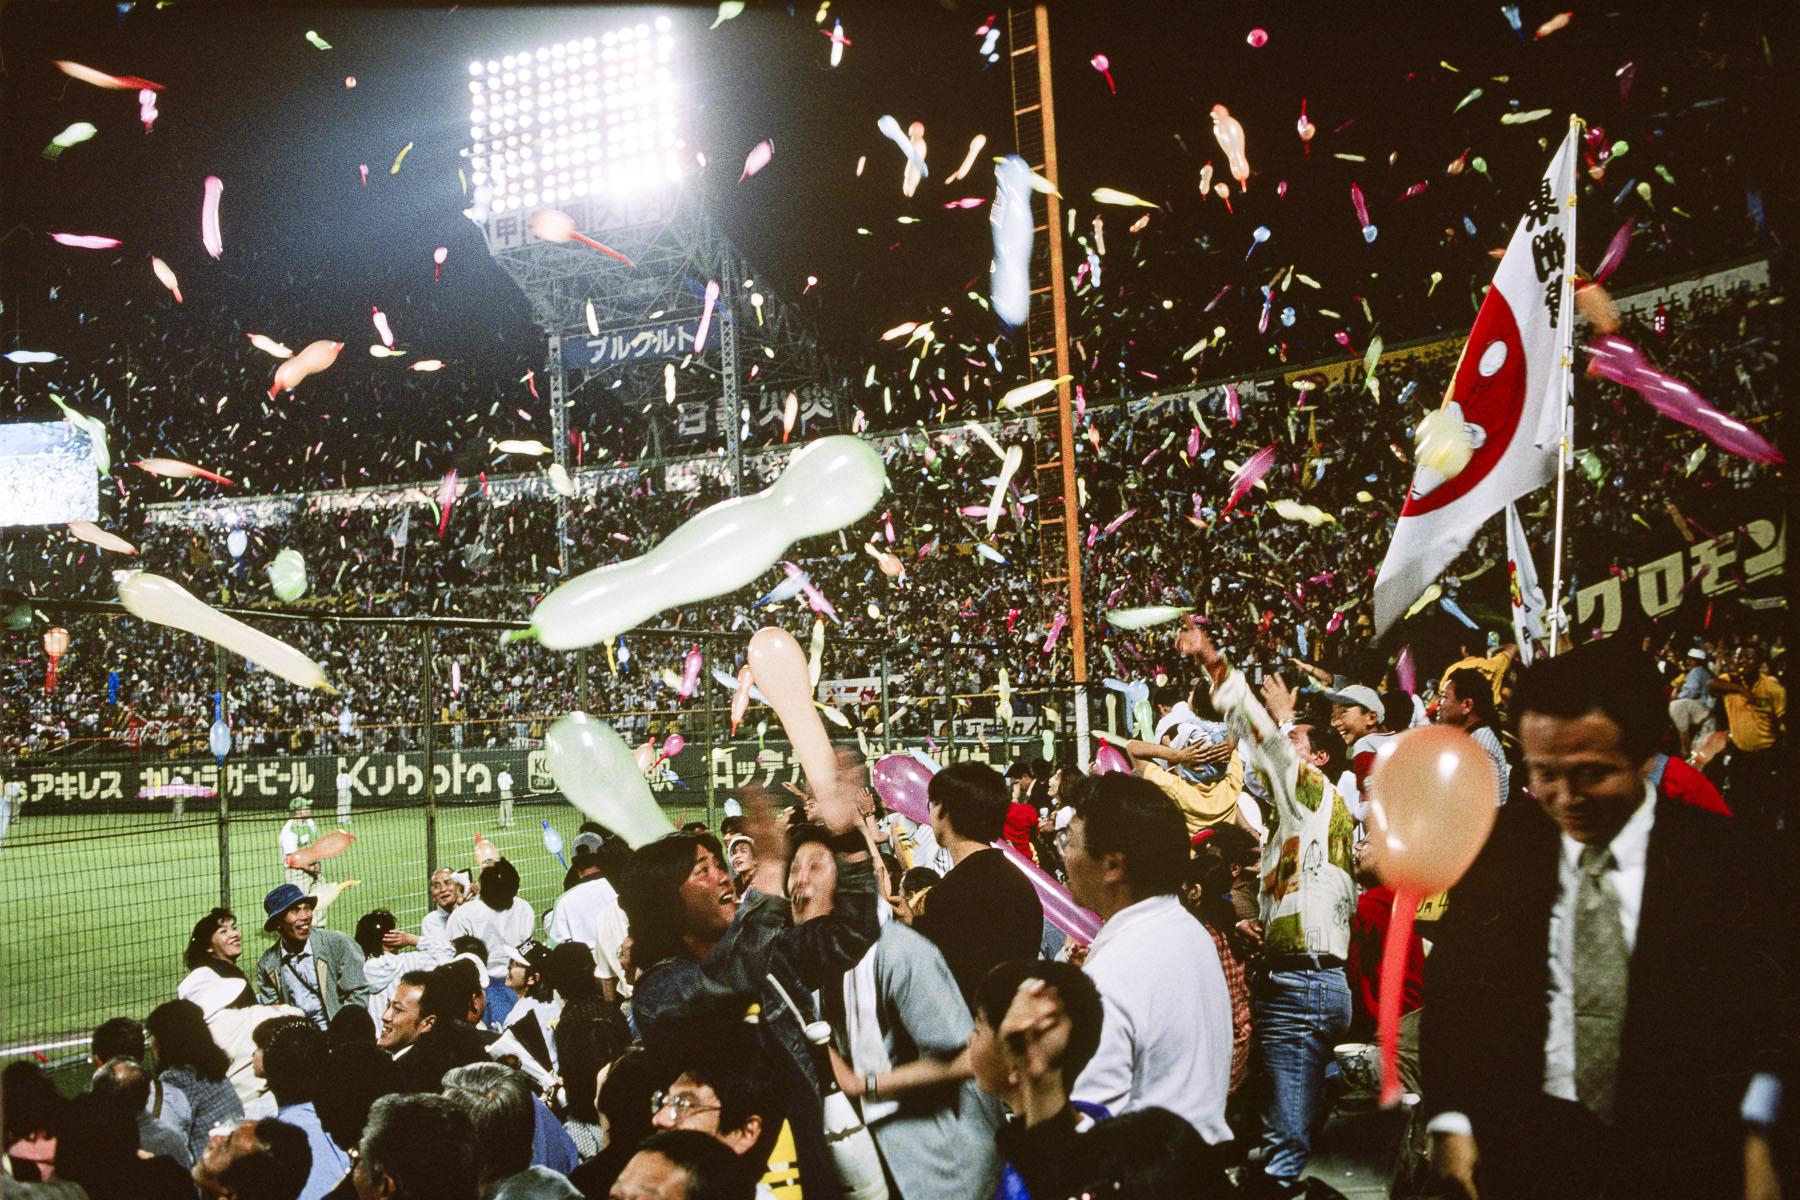 Base-ball match at the Hanshin Tigers stadium in May 1999